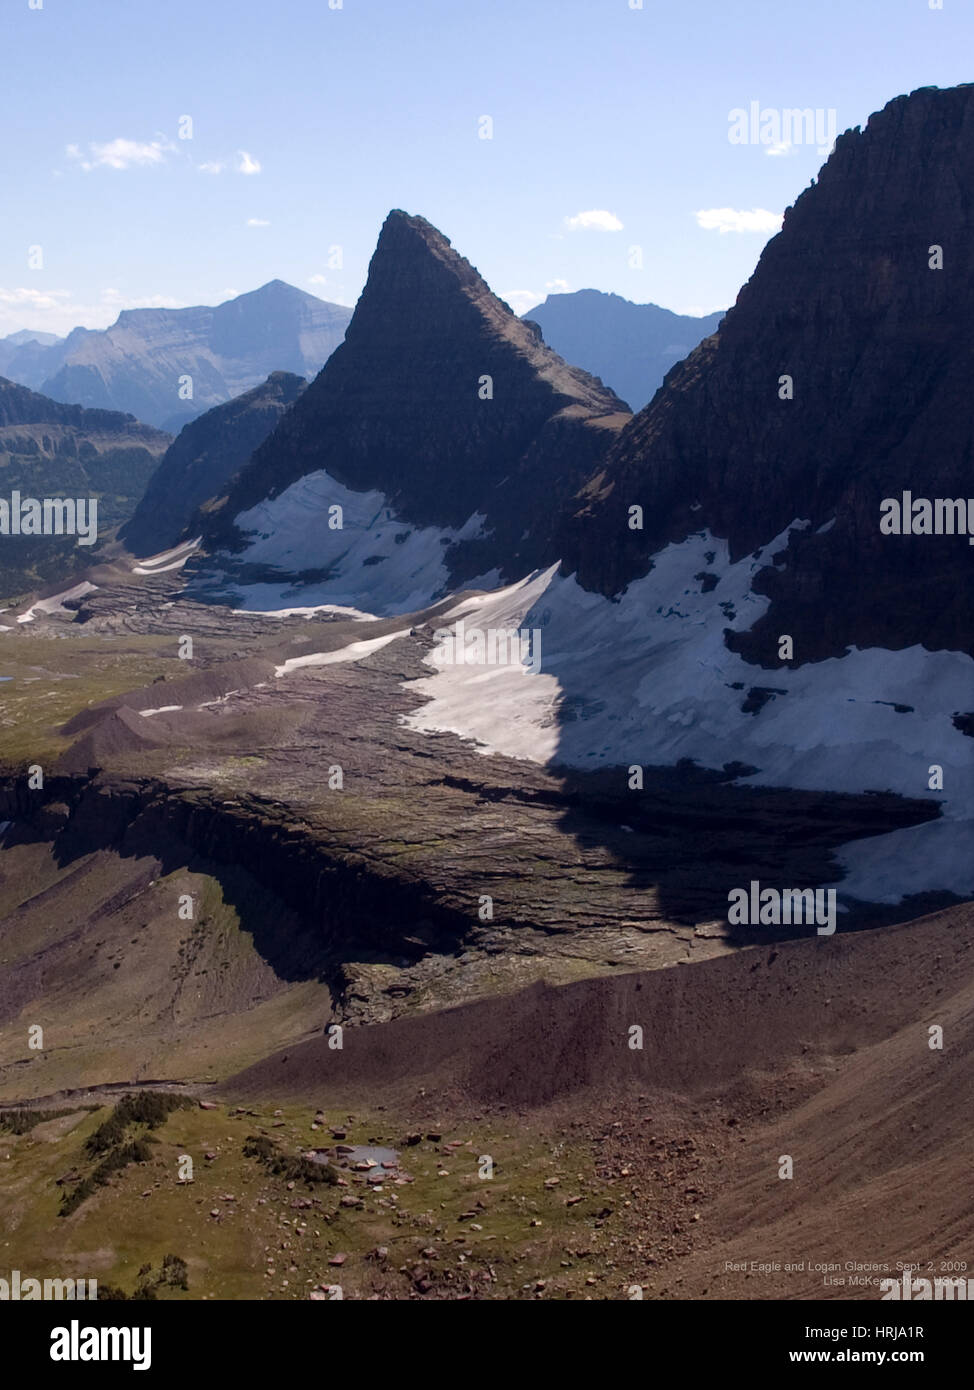 Red Eagle and Logan Glaciers, 2009 Stock Photo